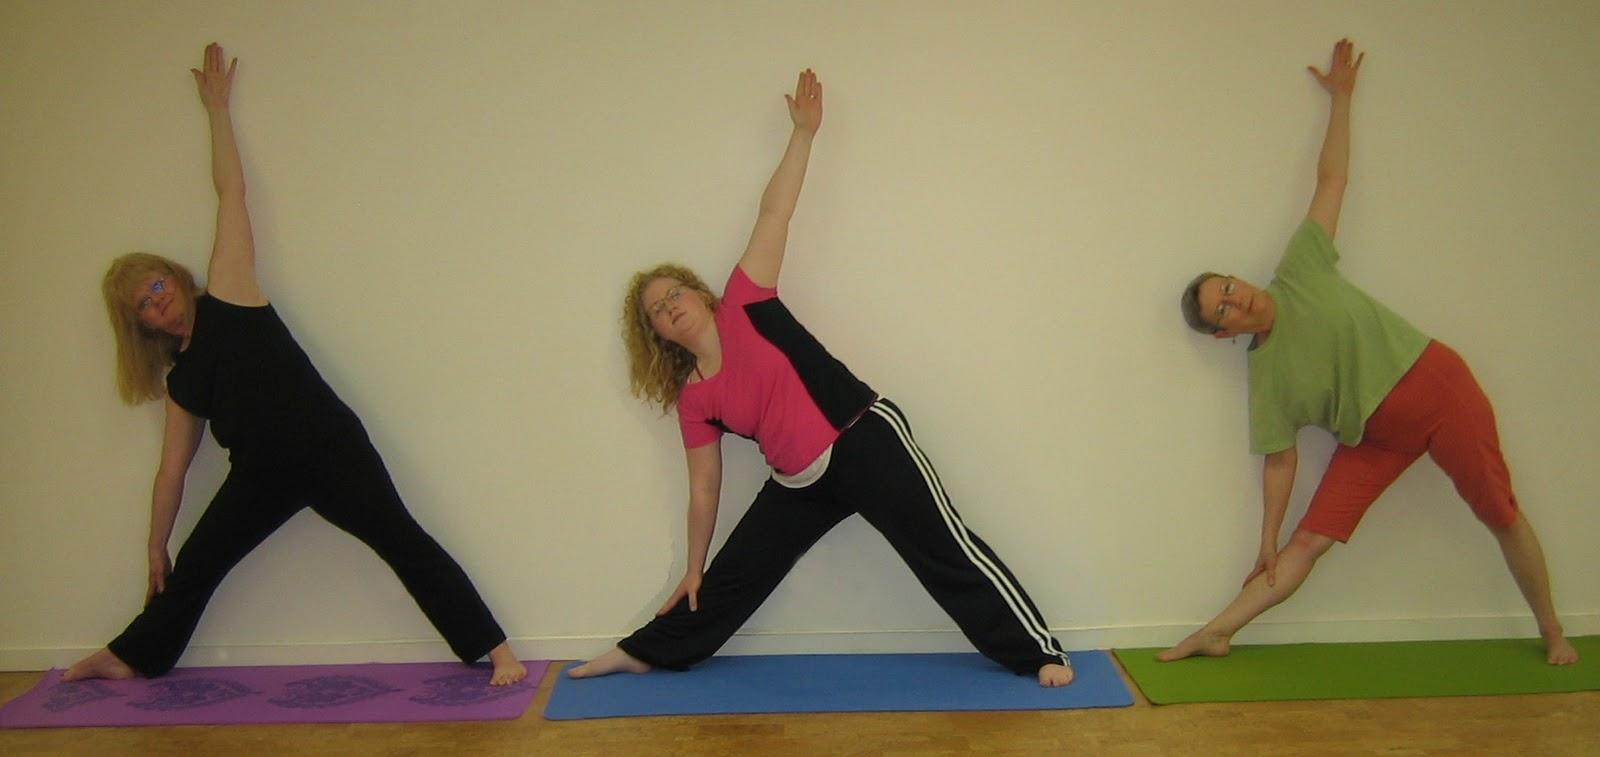 Harmony Yoga of Ann Arbor: Why Practice Yoga Standing Poses?